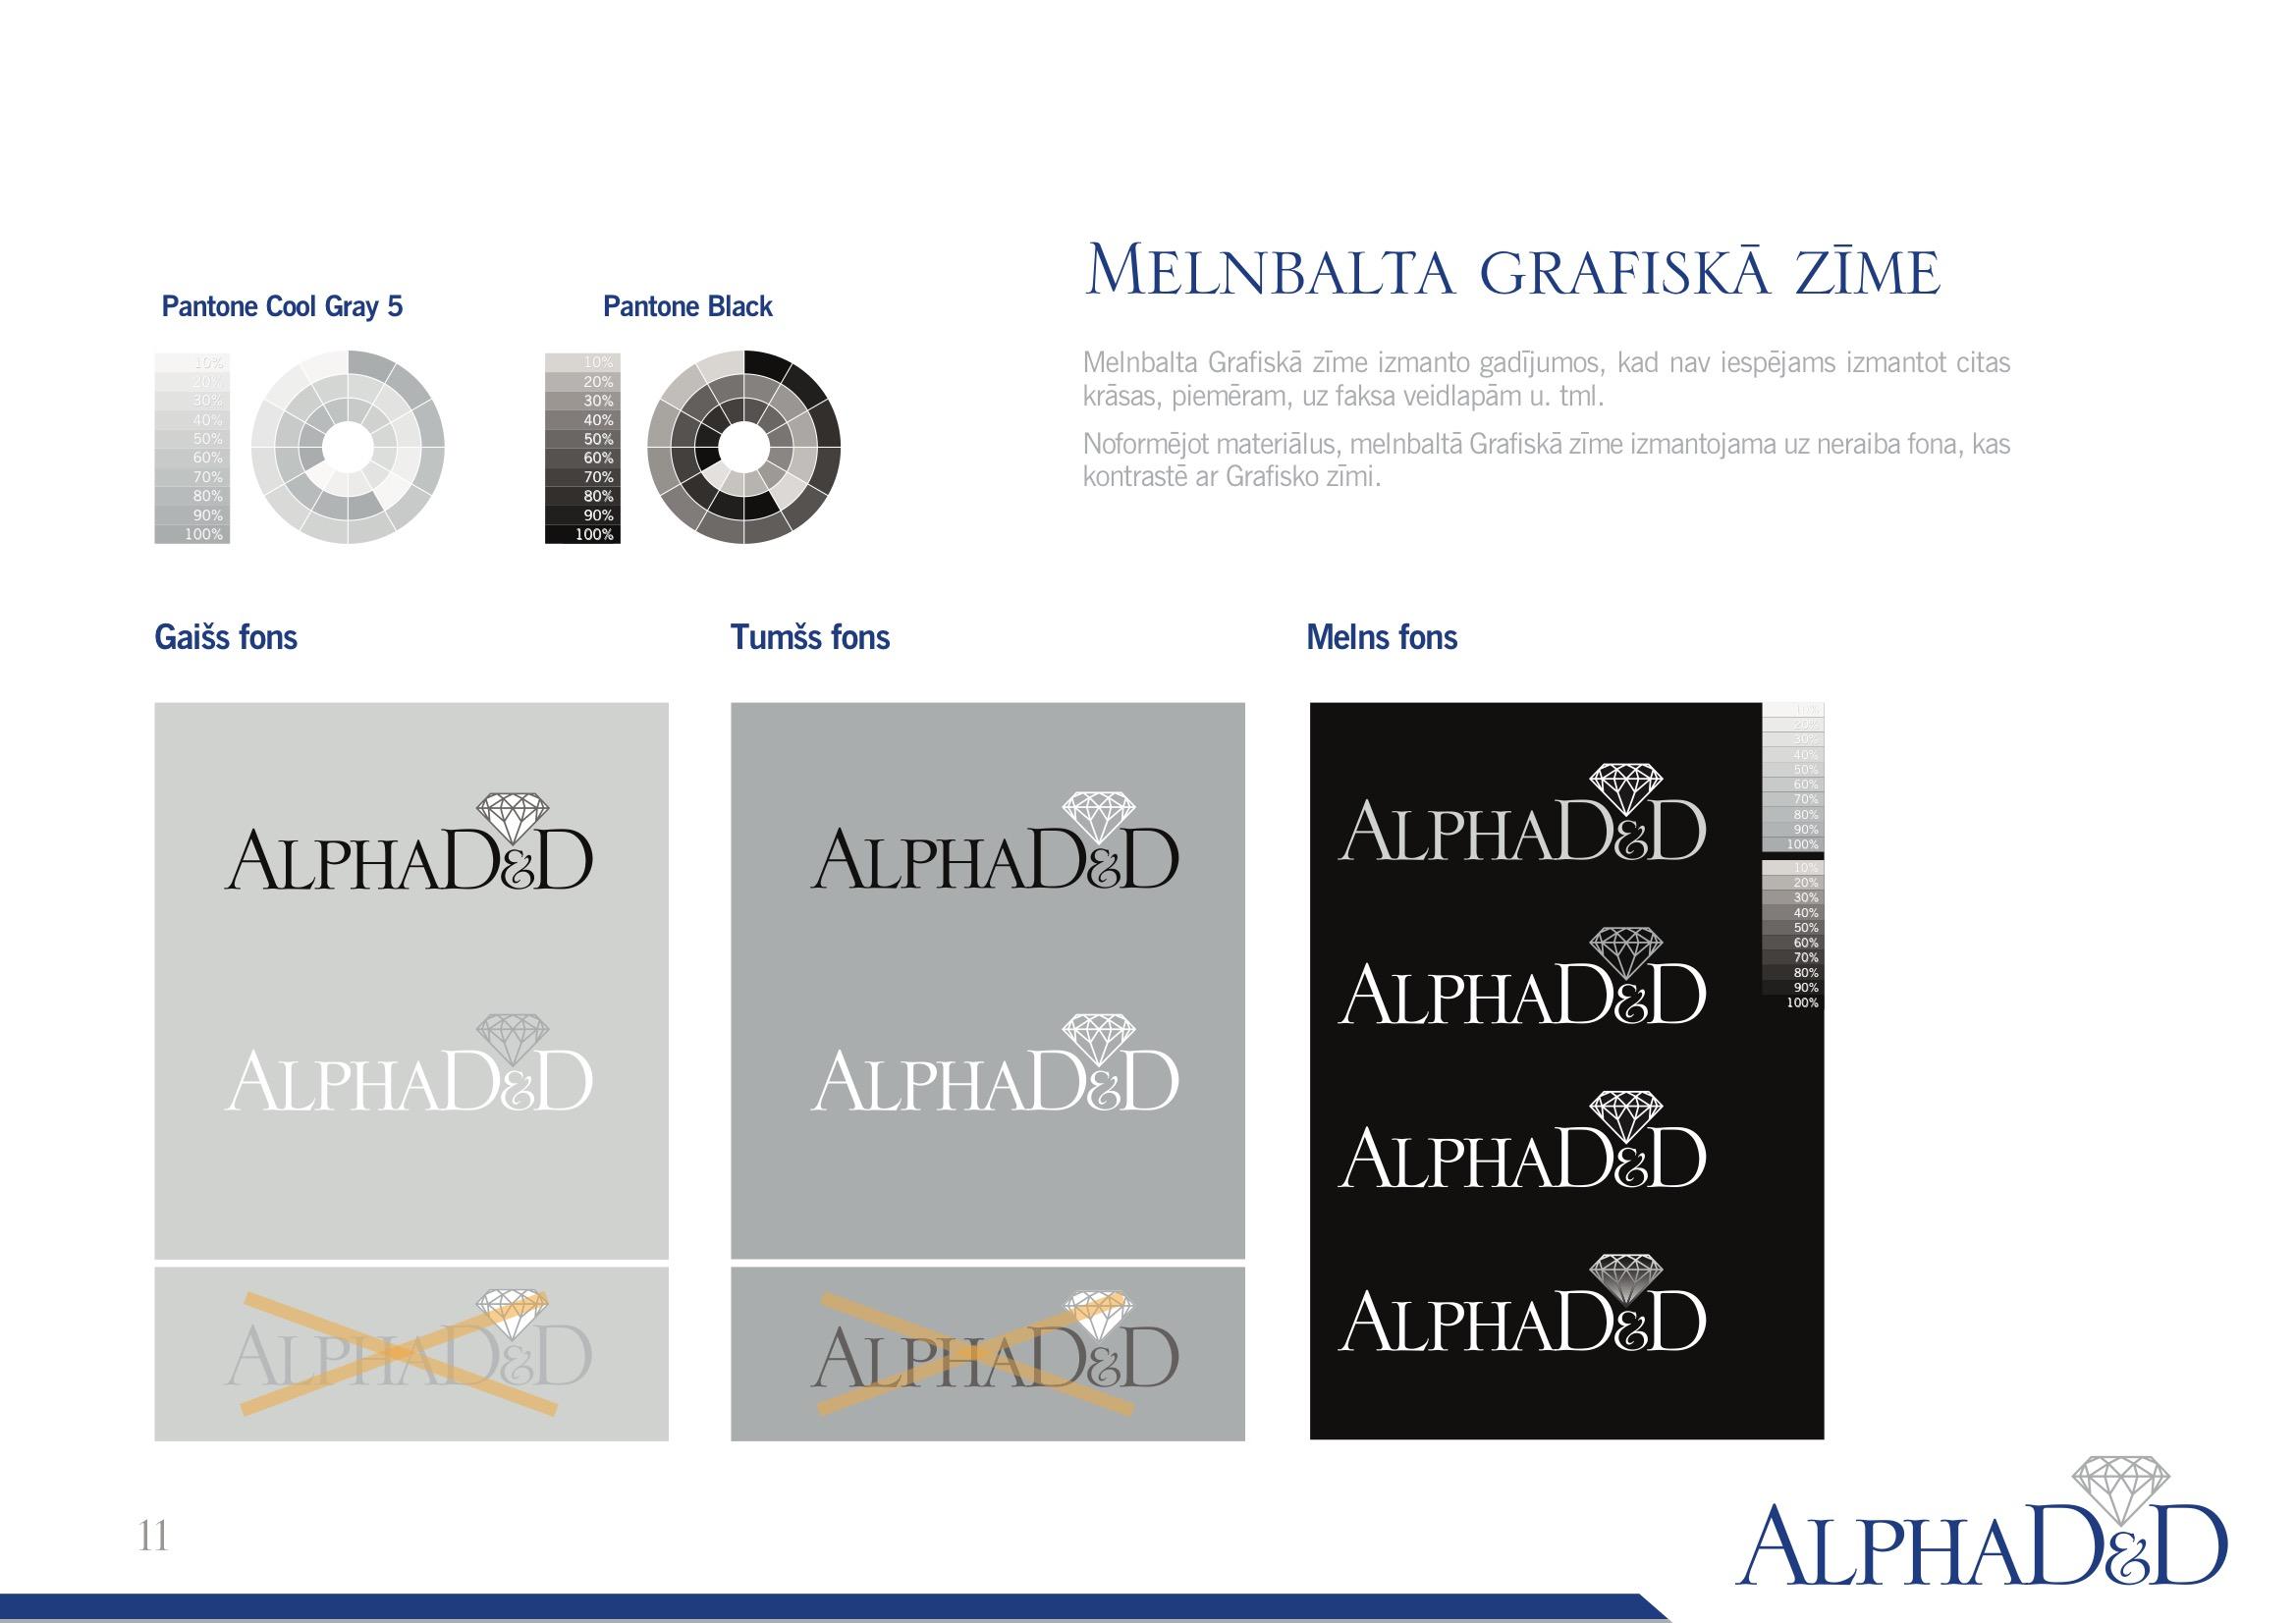 AlphaDD_Stils 11